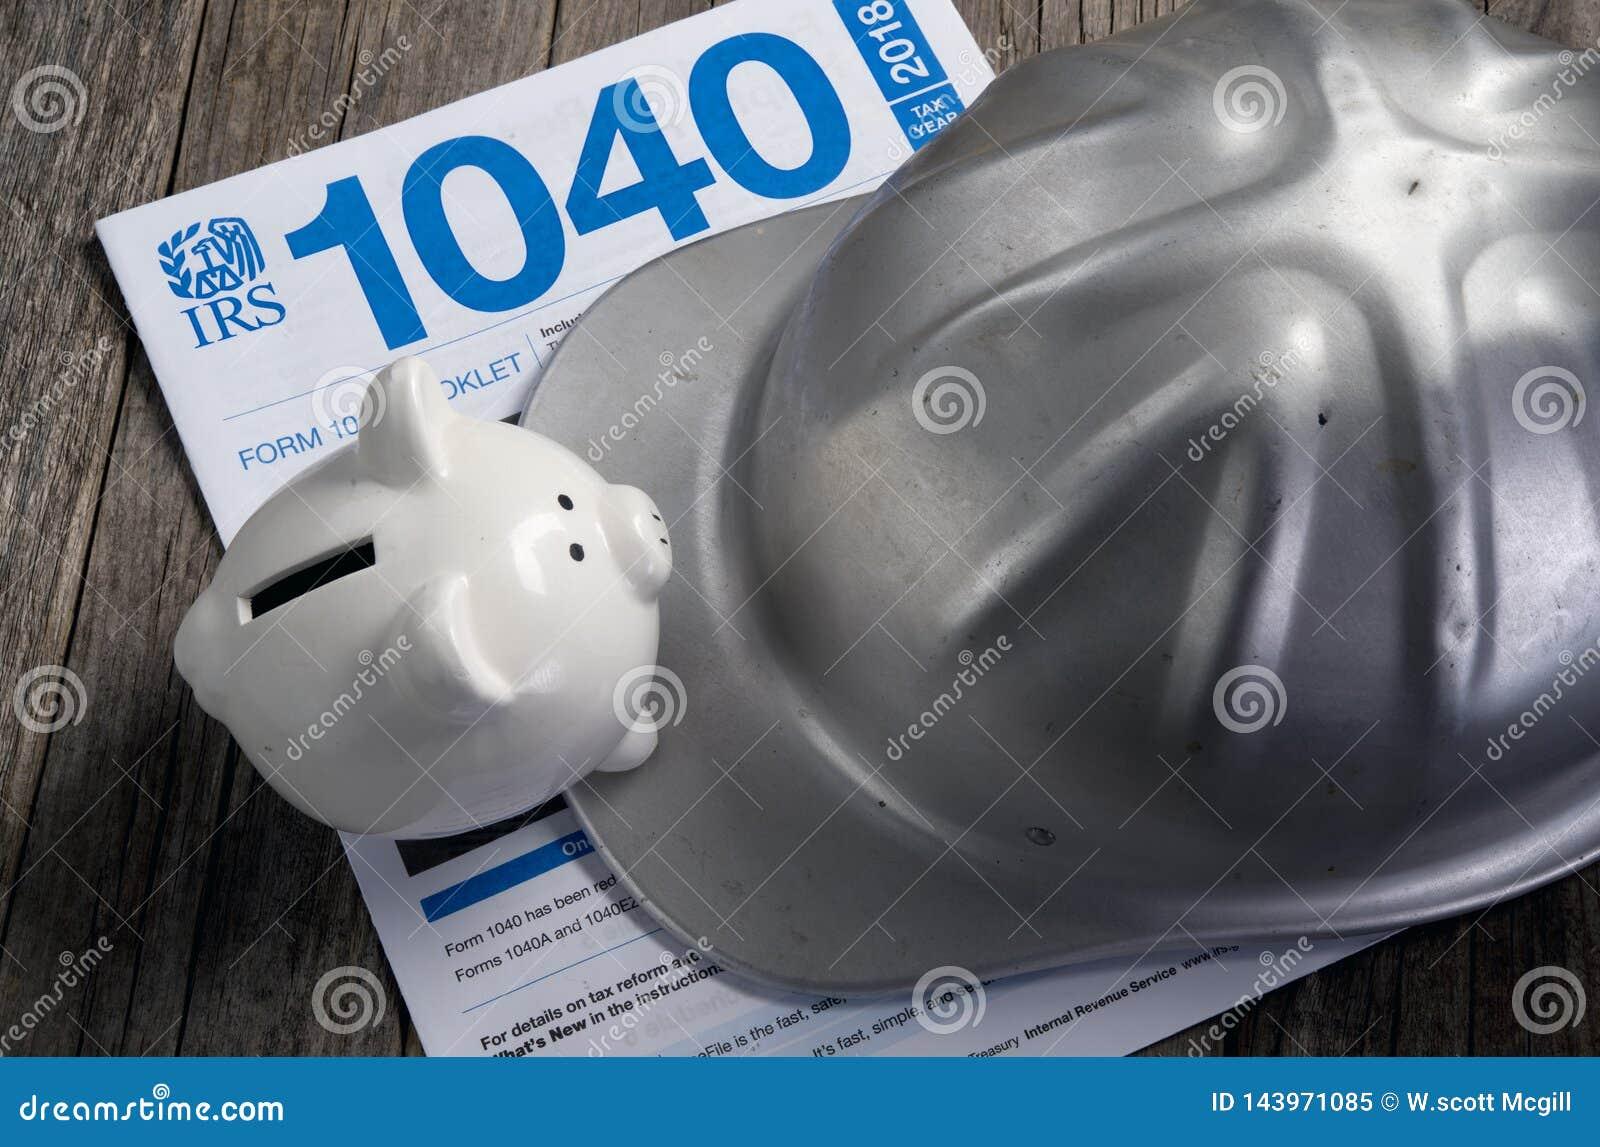 Форма IRS 1040